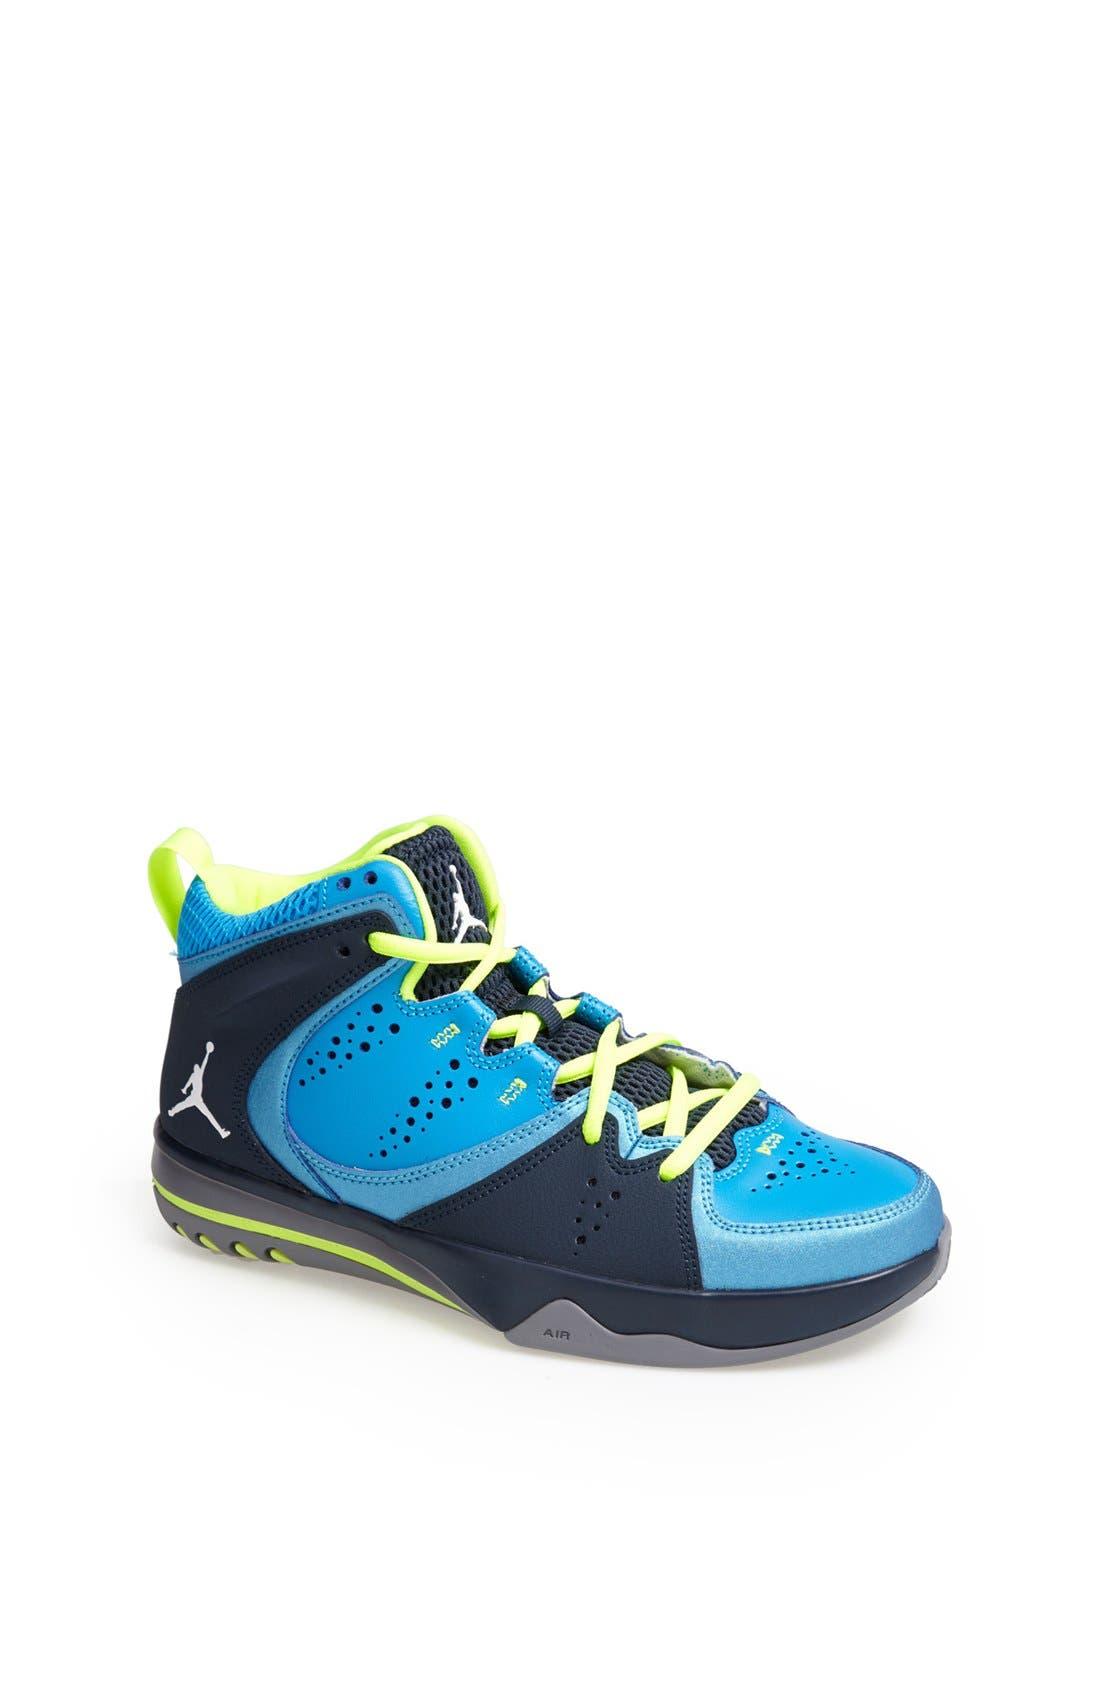 Main Image - Nike 'Jordan Phase 23 2' Sneaker (Big Kid)